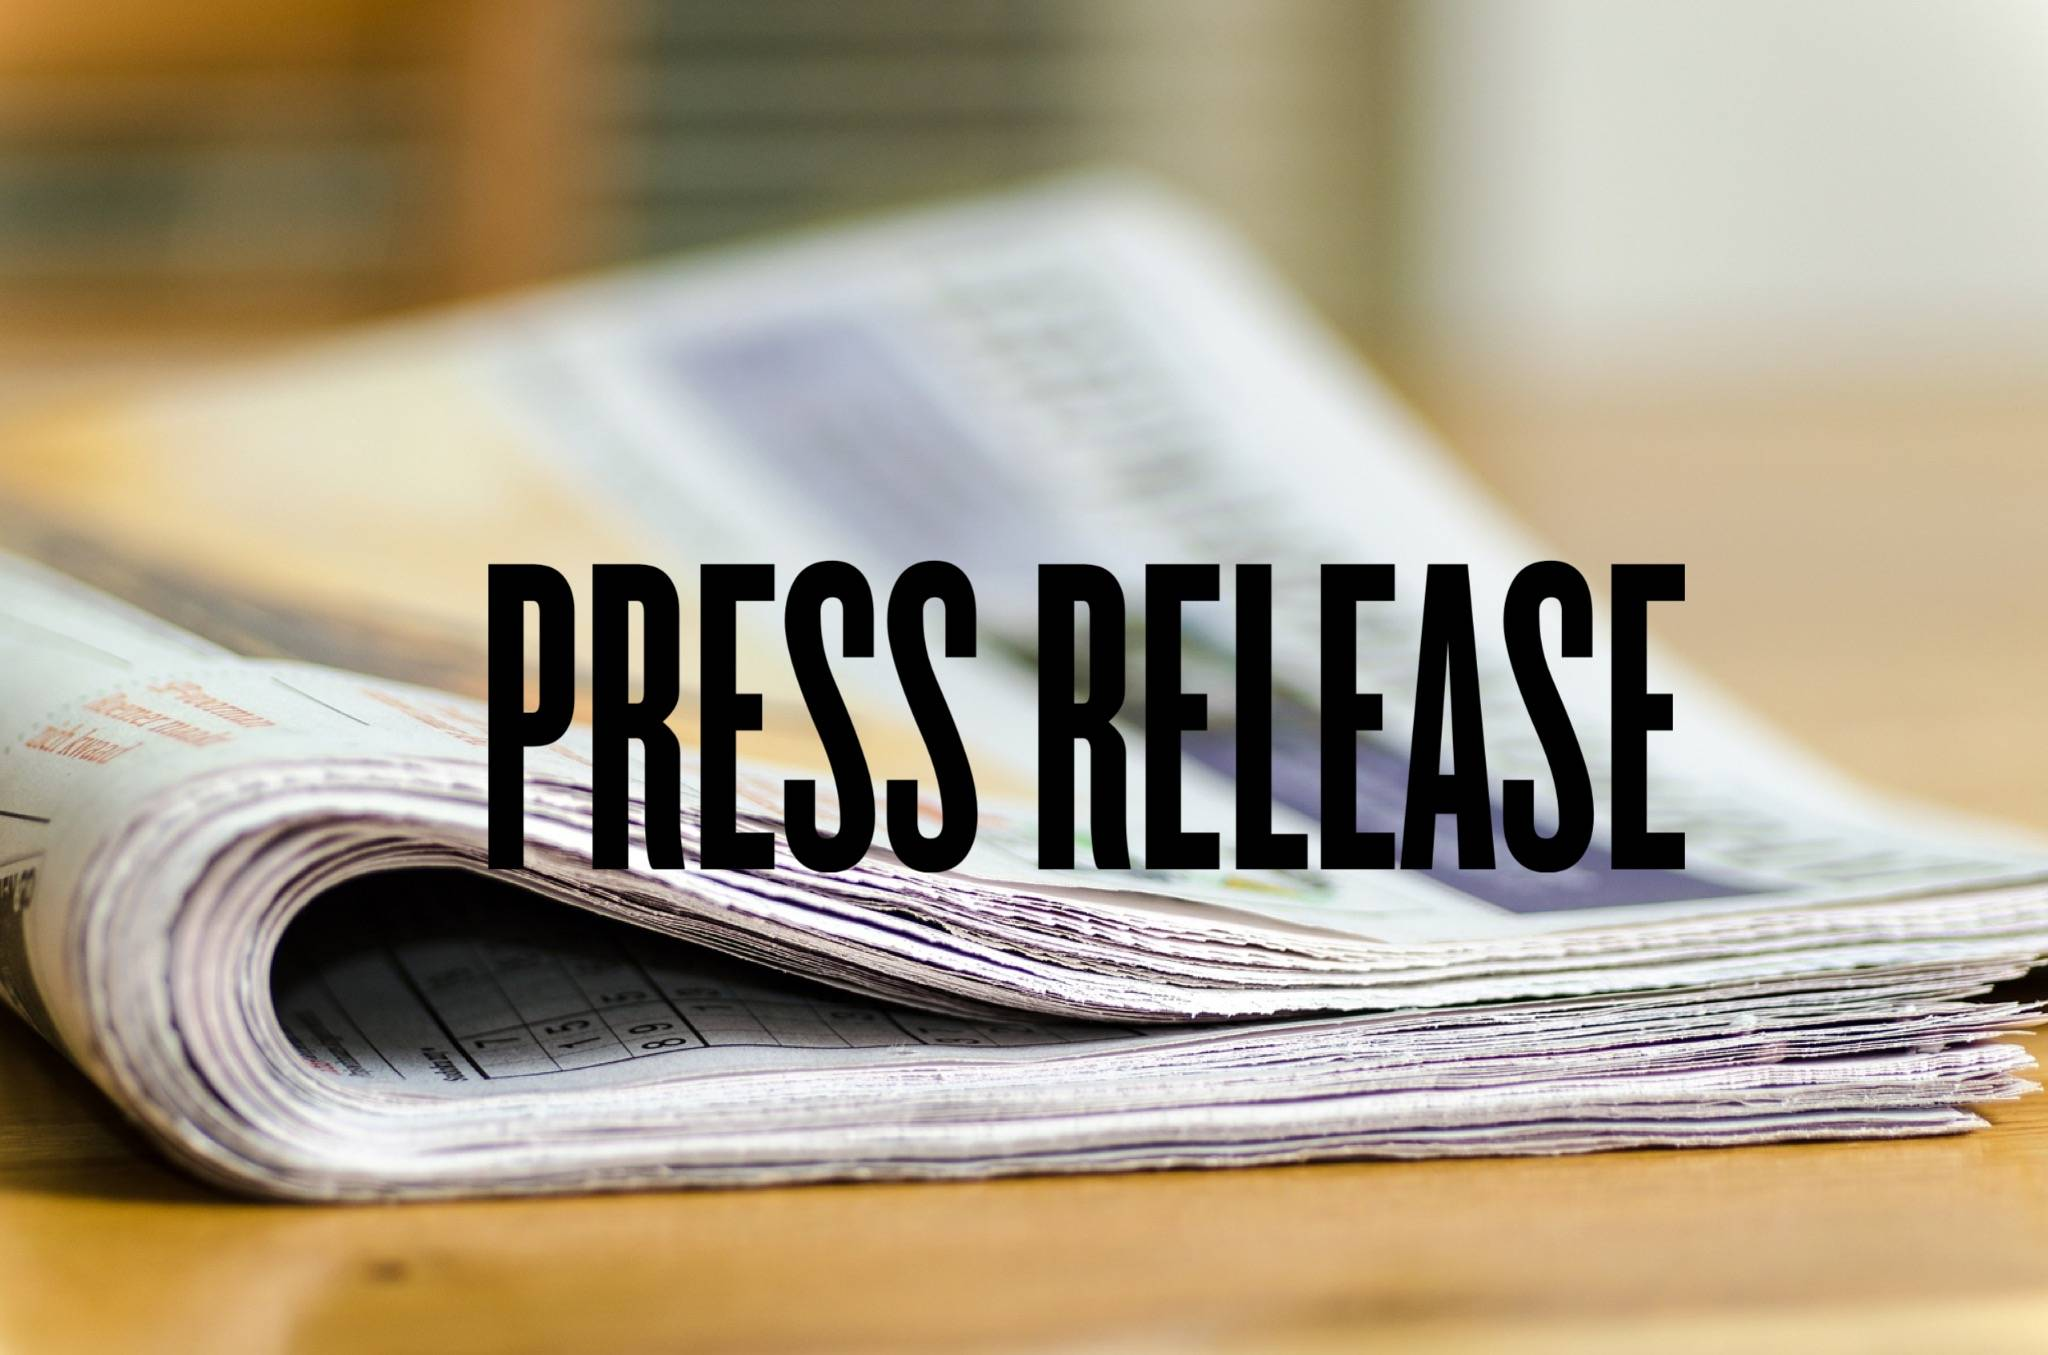 press_release_icon.jpg (2048×1355)